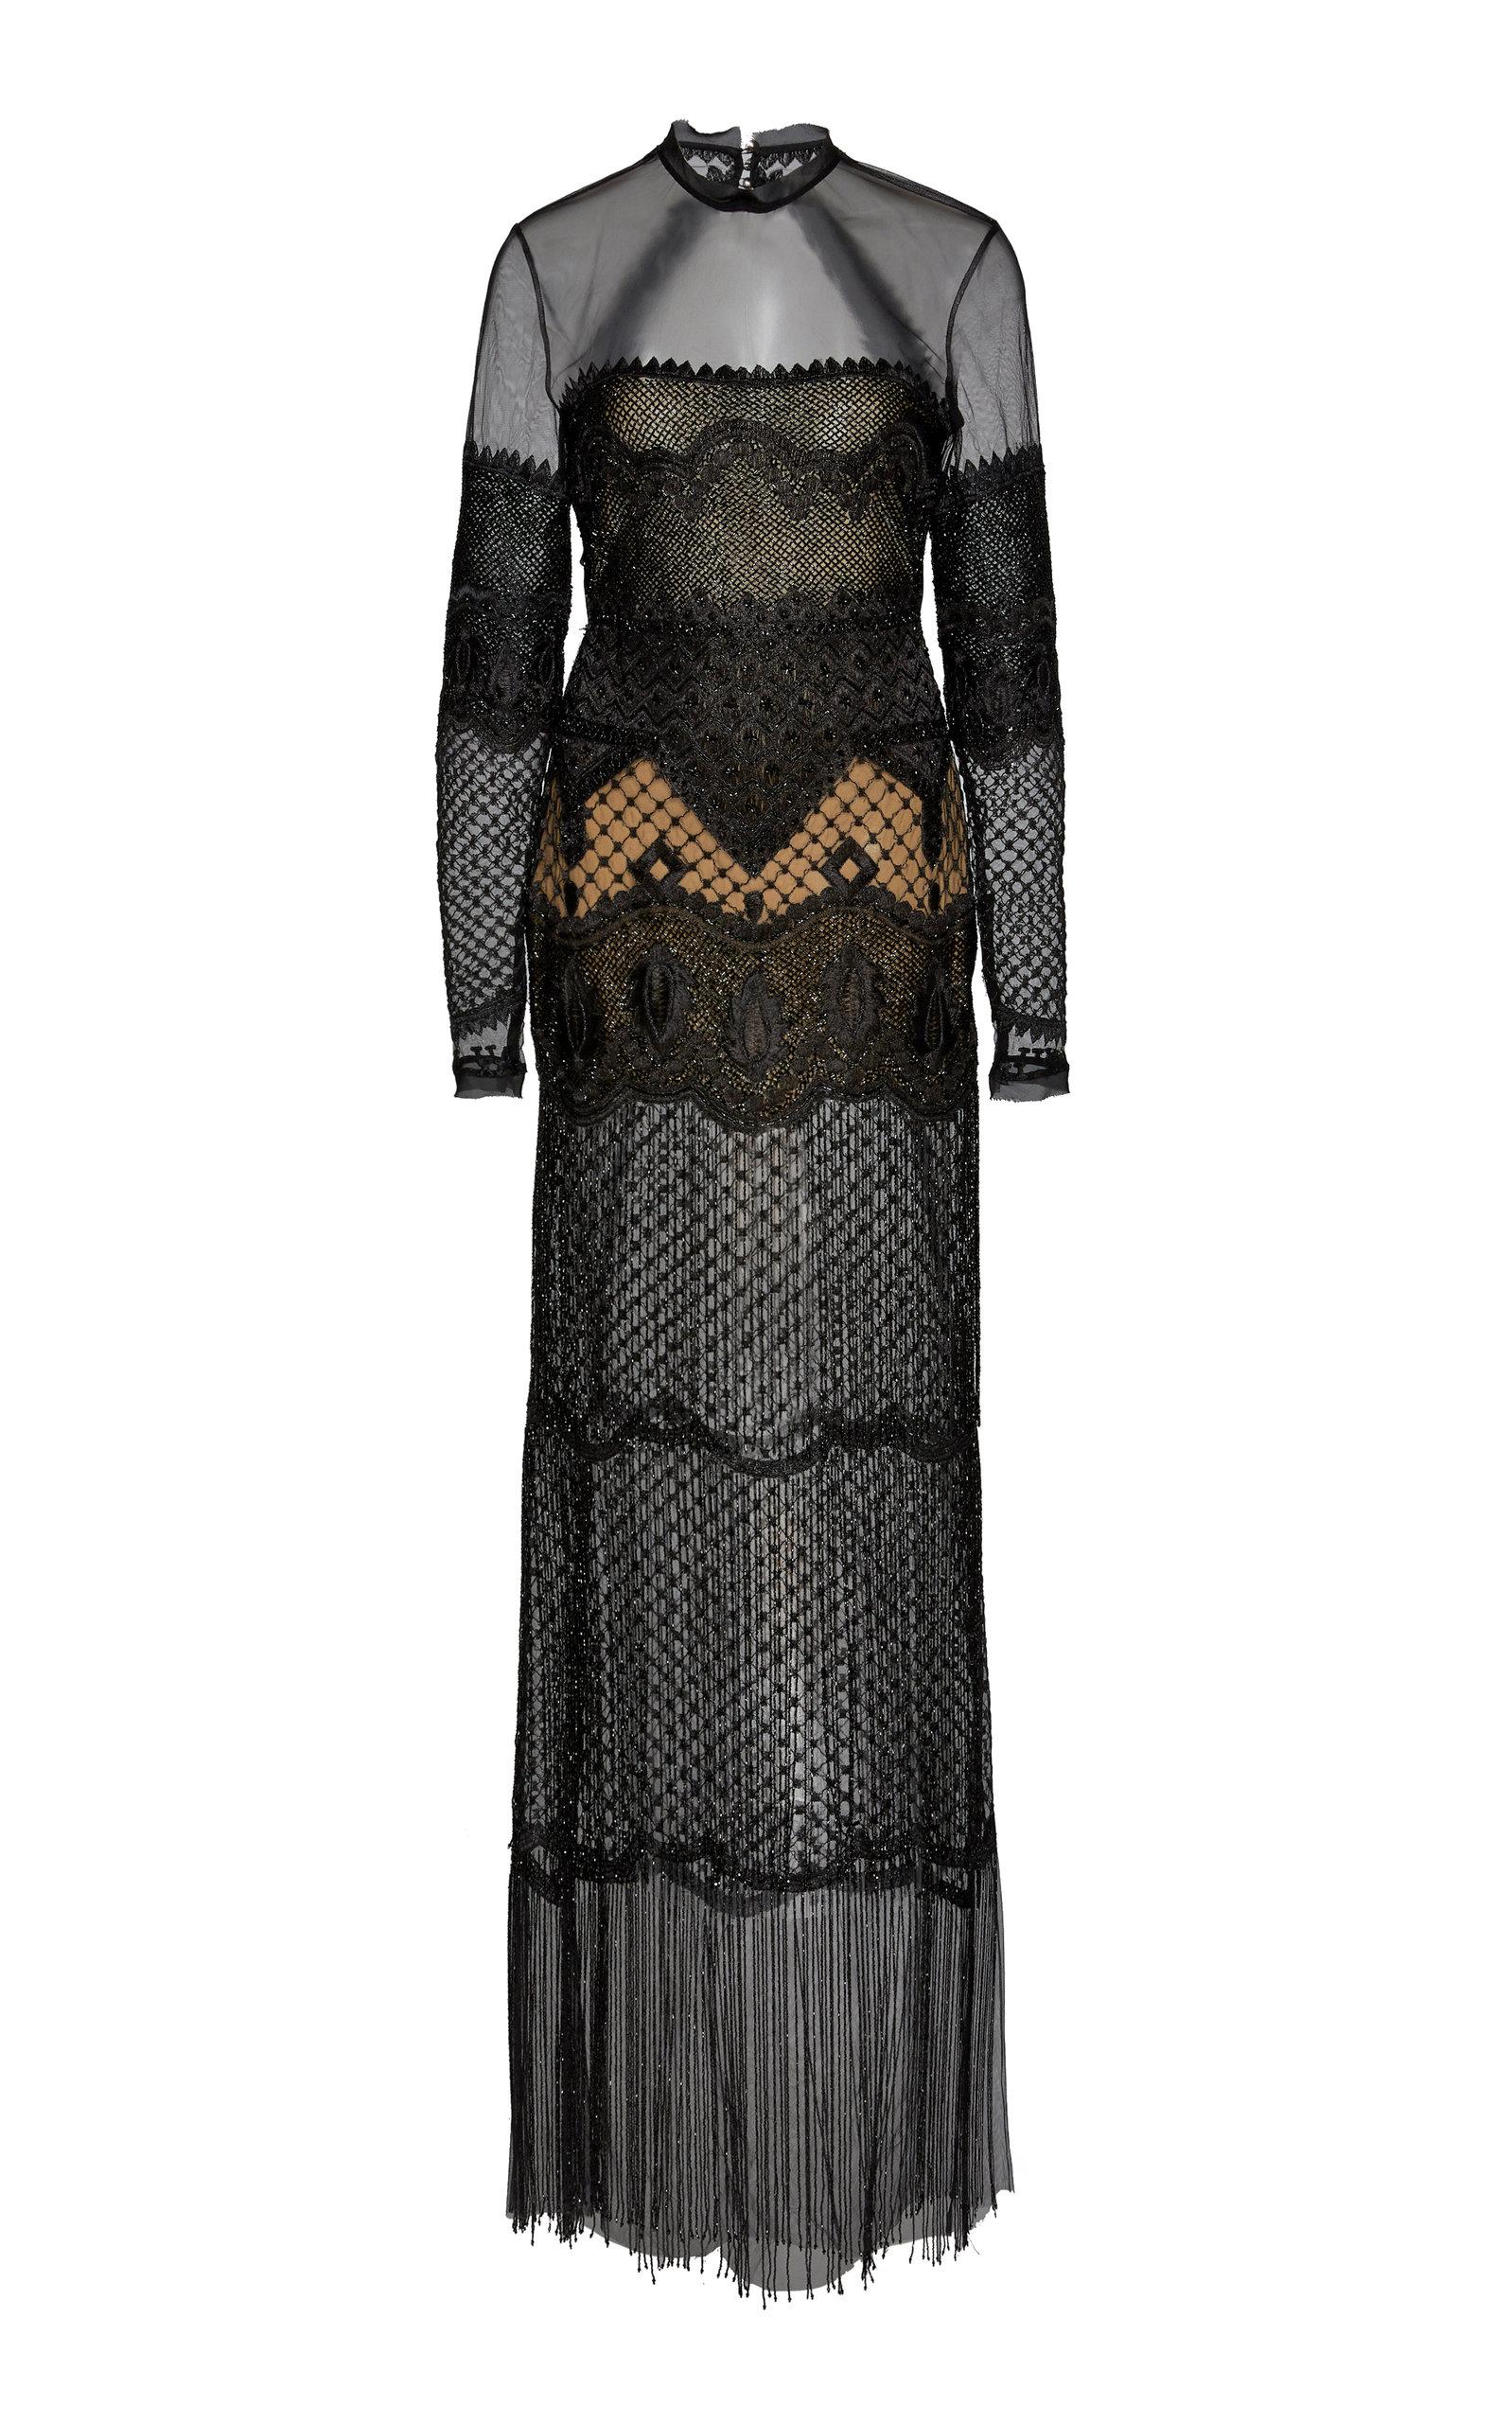 CUCCULELLI SHAHEEN Midnight Dreamweaver Tulle Gown in Black